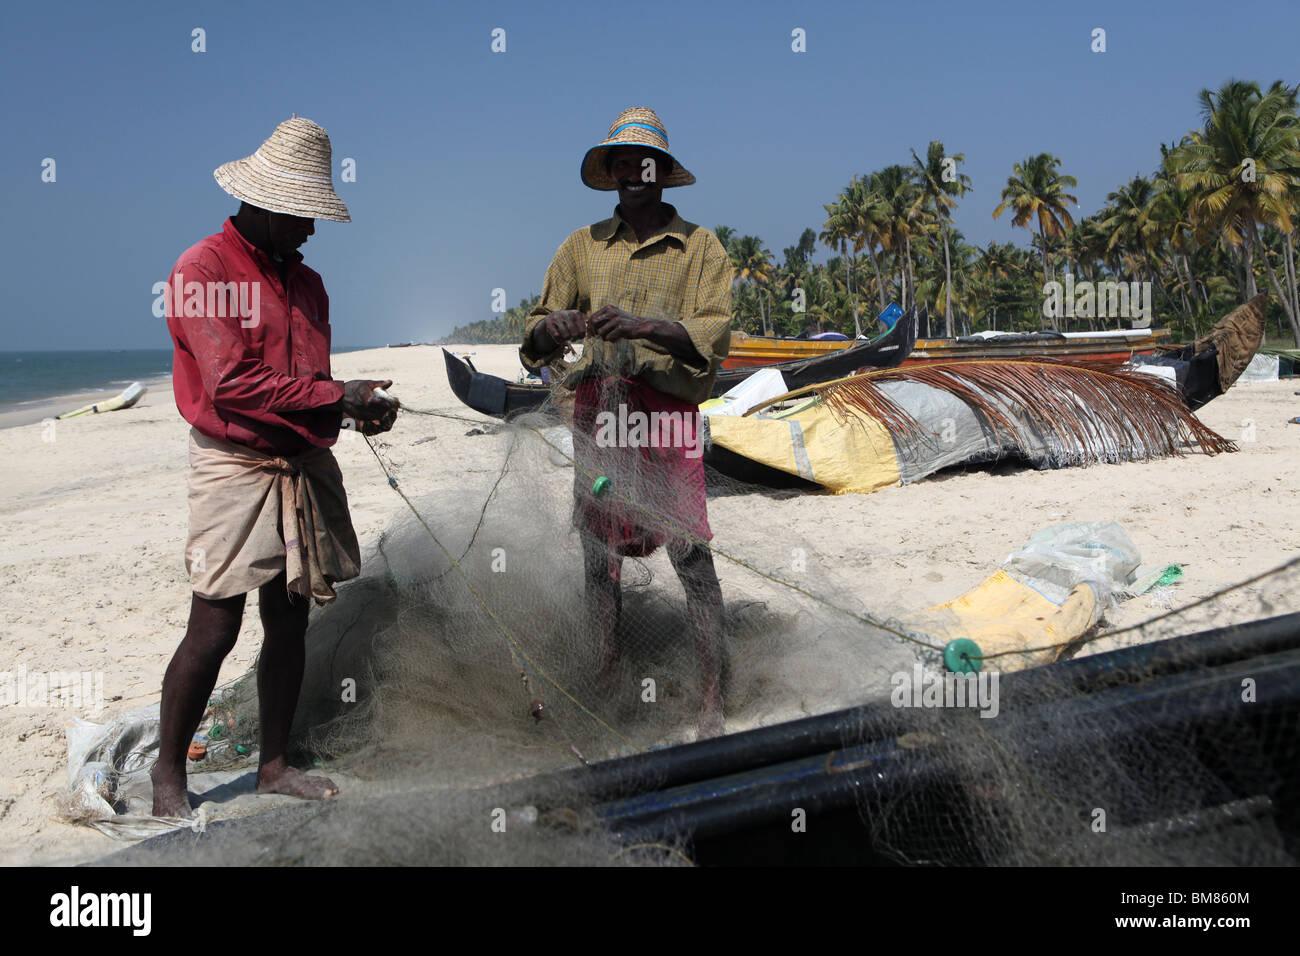 Fishermen working on Marari Beach or Secret Beach near the town of Alleppey in Kerala, India. Stock Photo